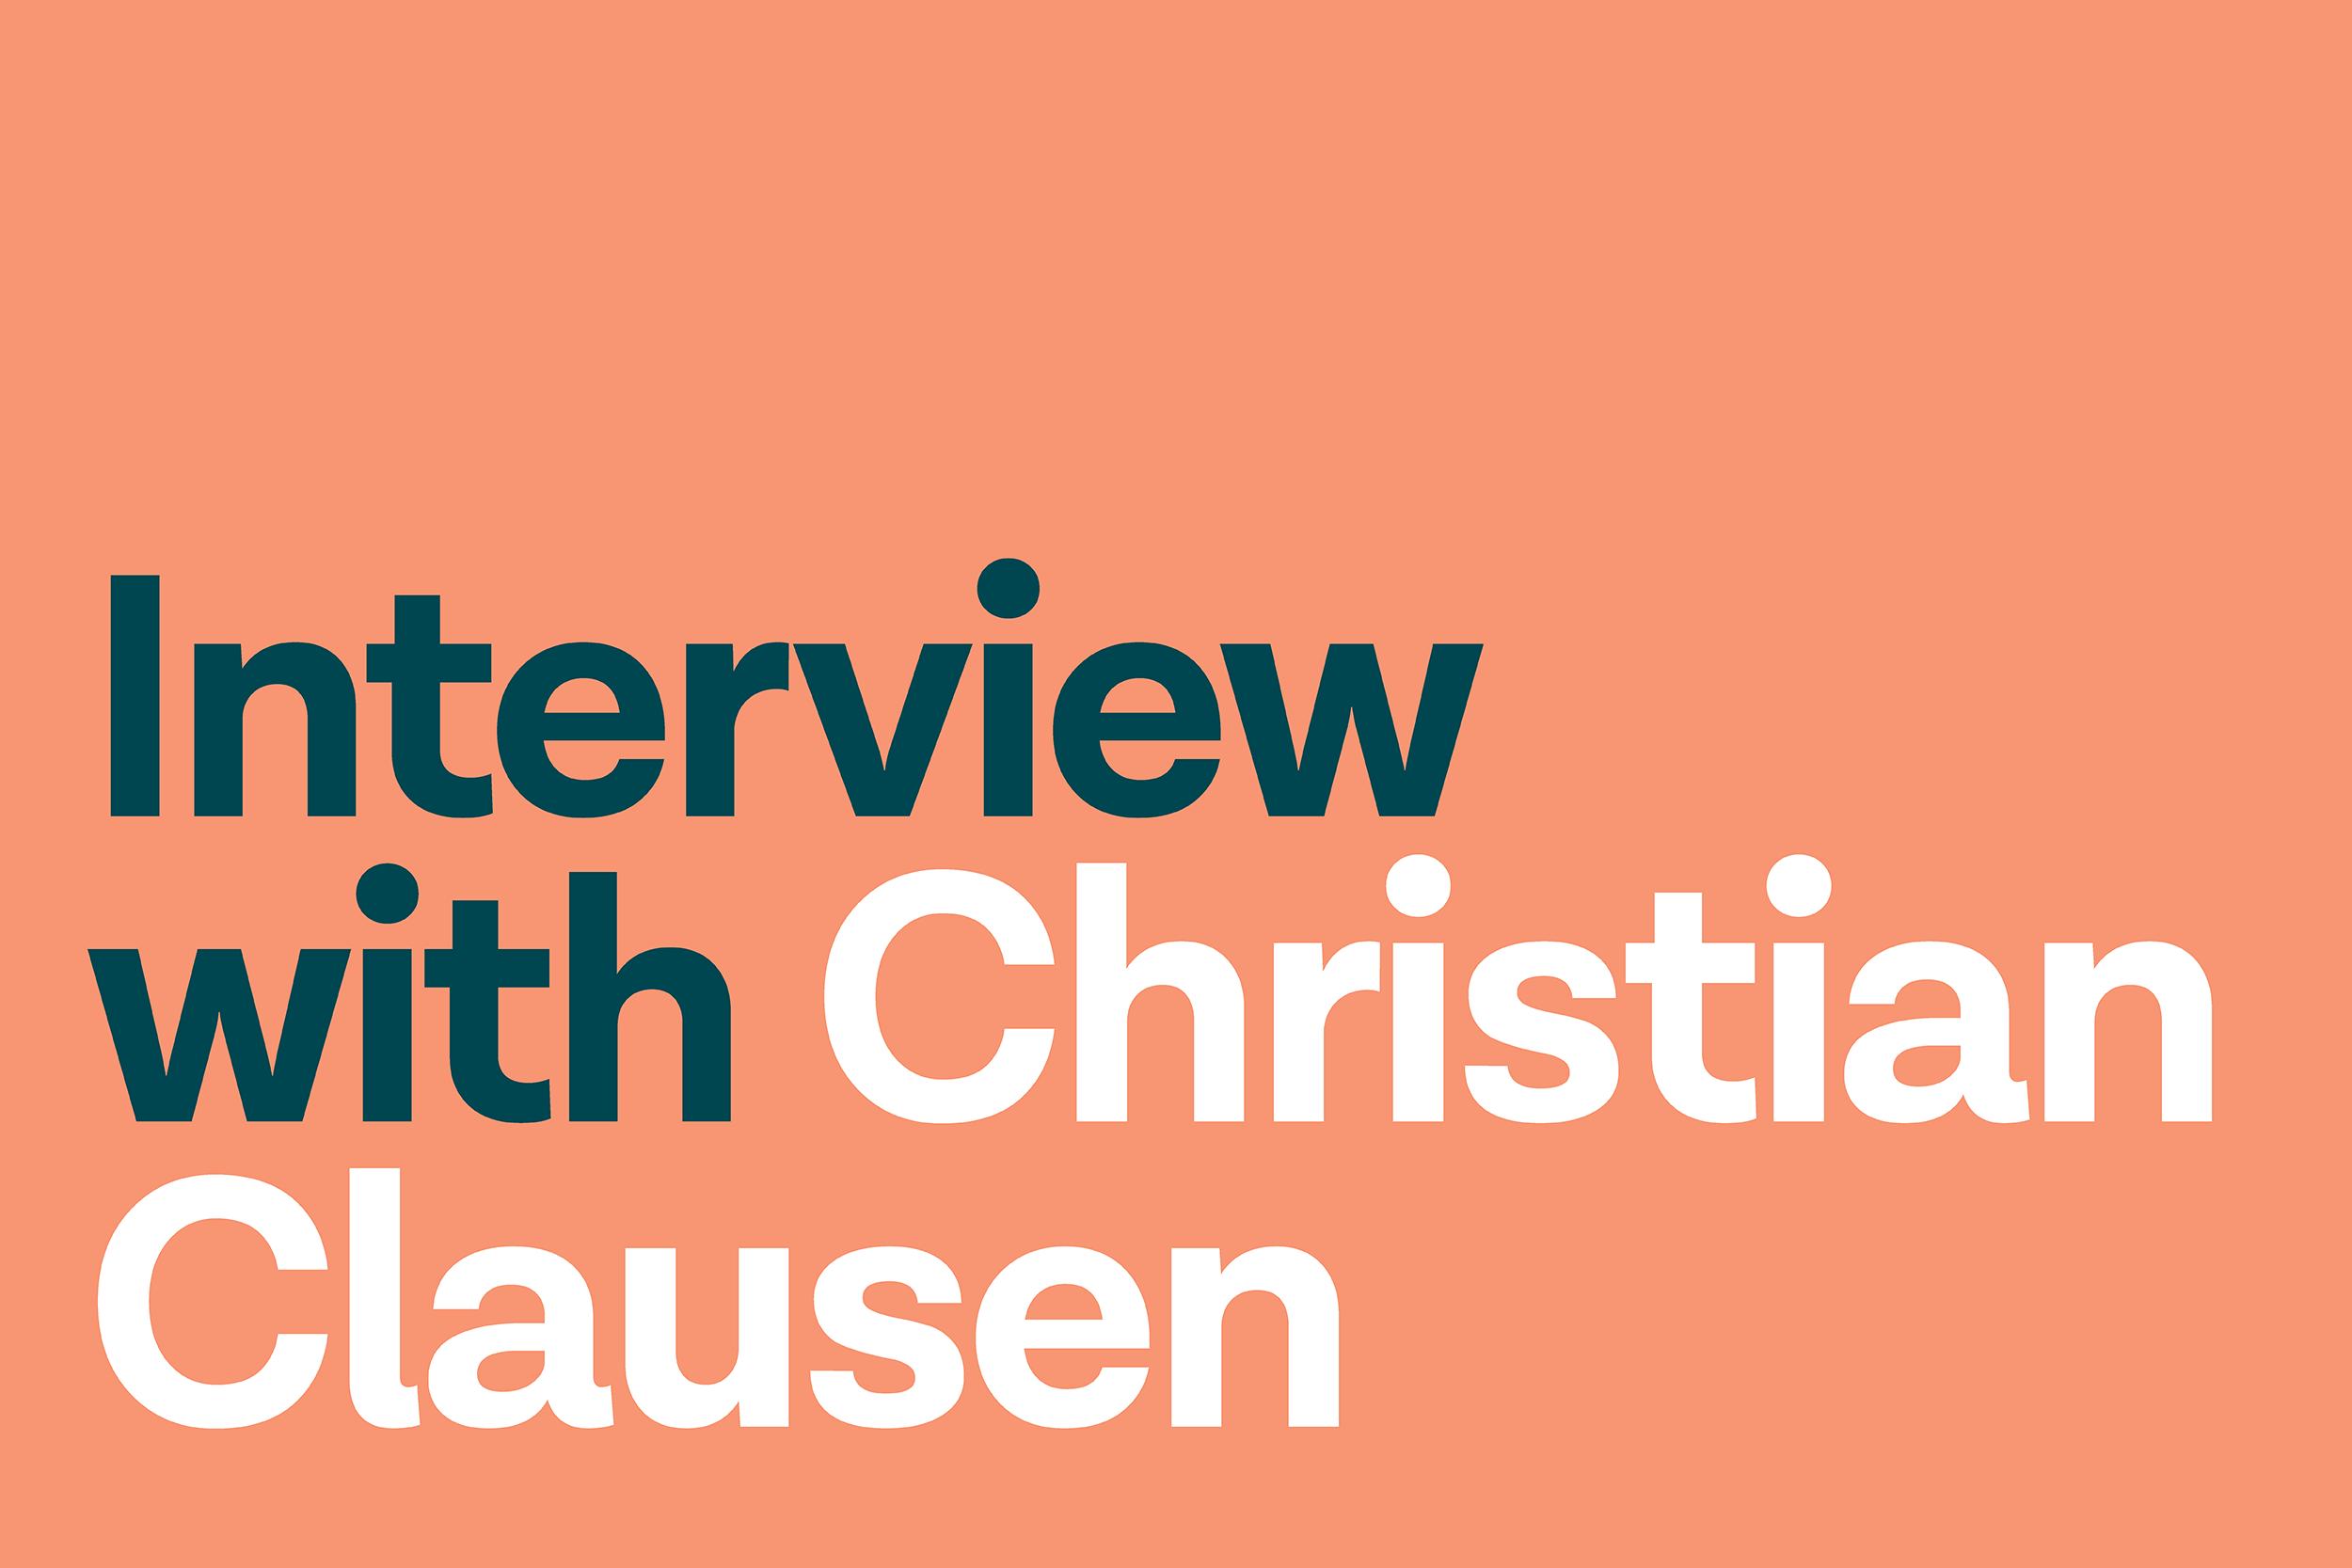 1707_interview_christianclausen_Blogpost.png